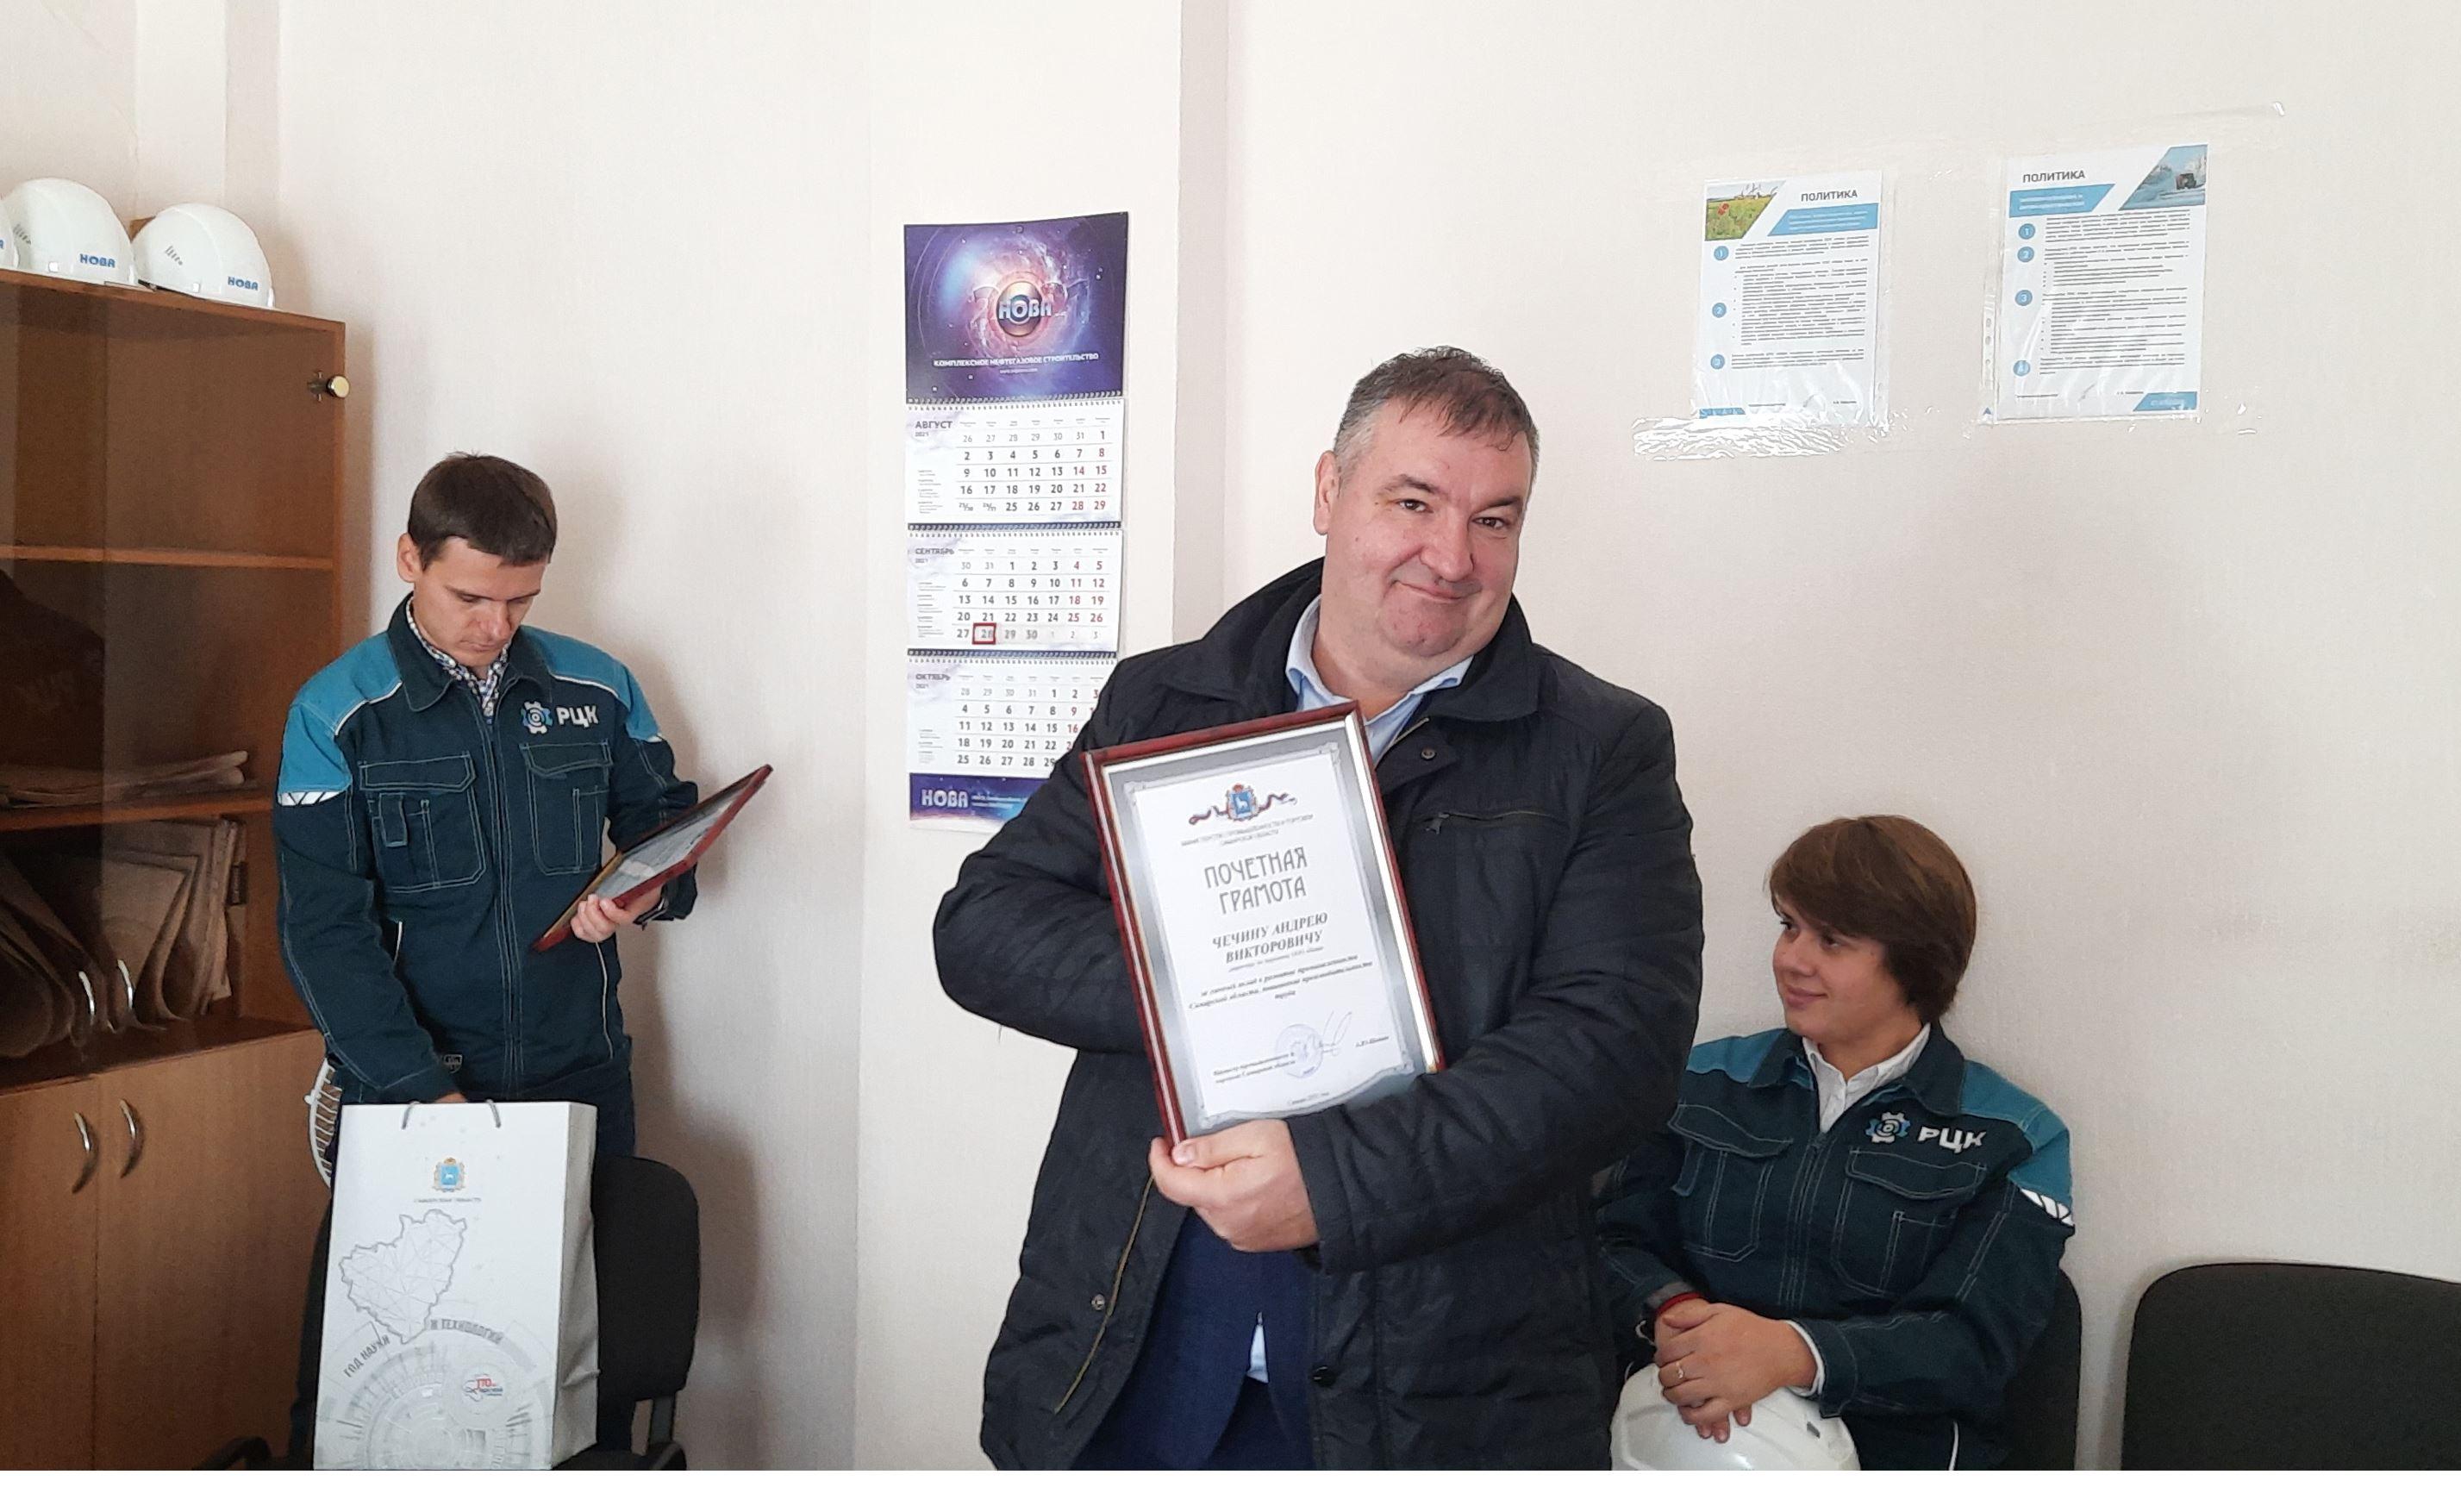 Благодаря нацпроекту предприятие «НОВА» ускорило производство металлоконструкций